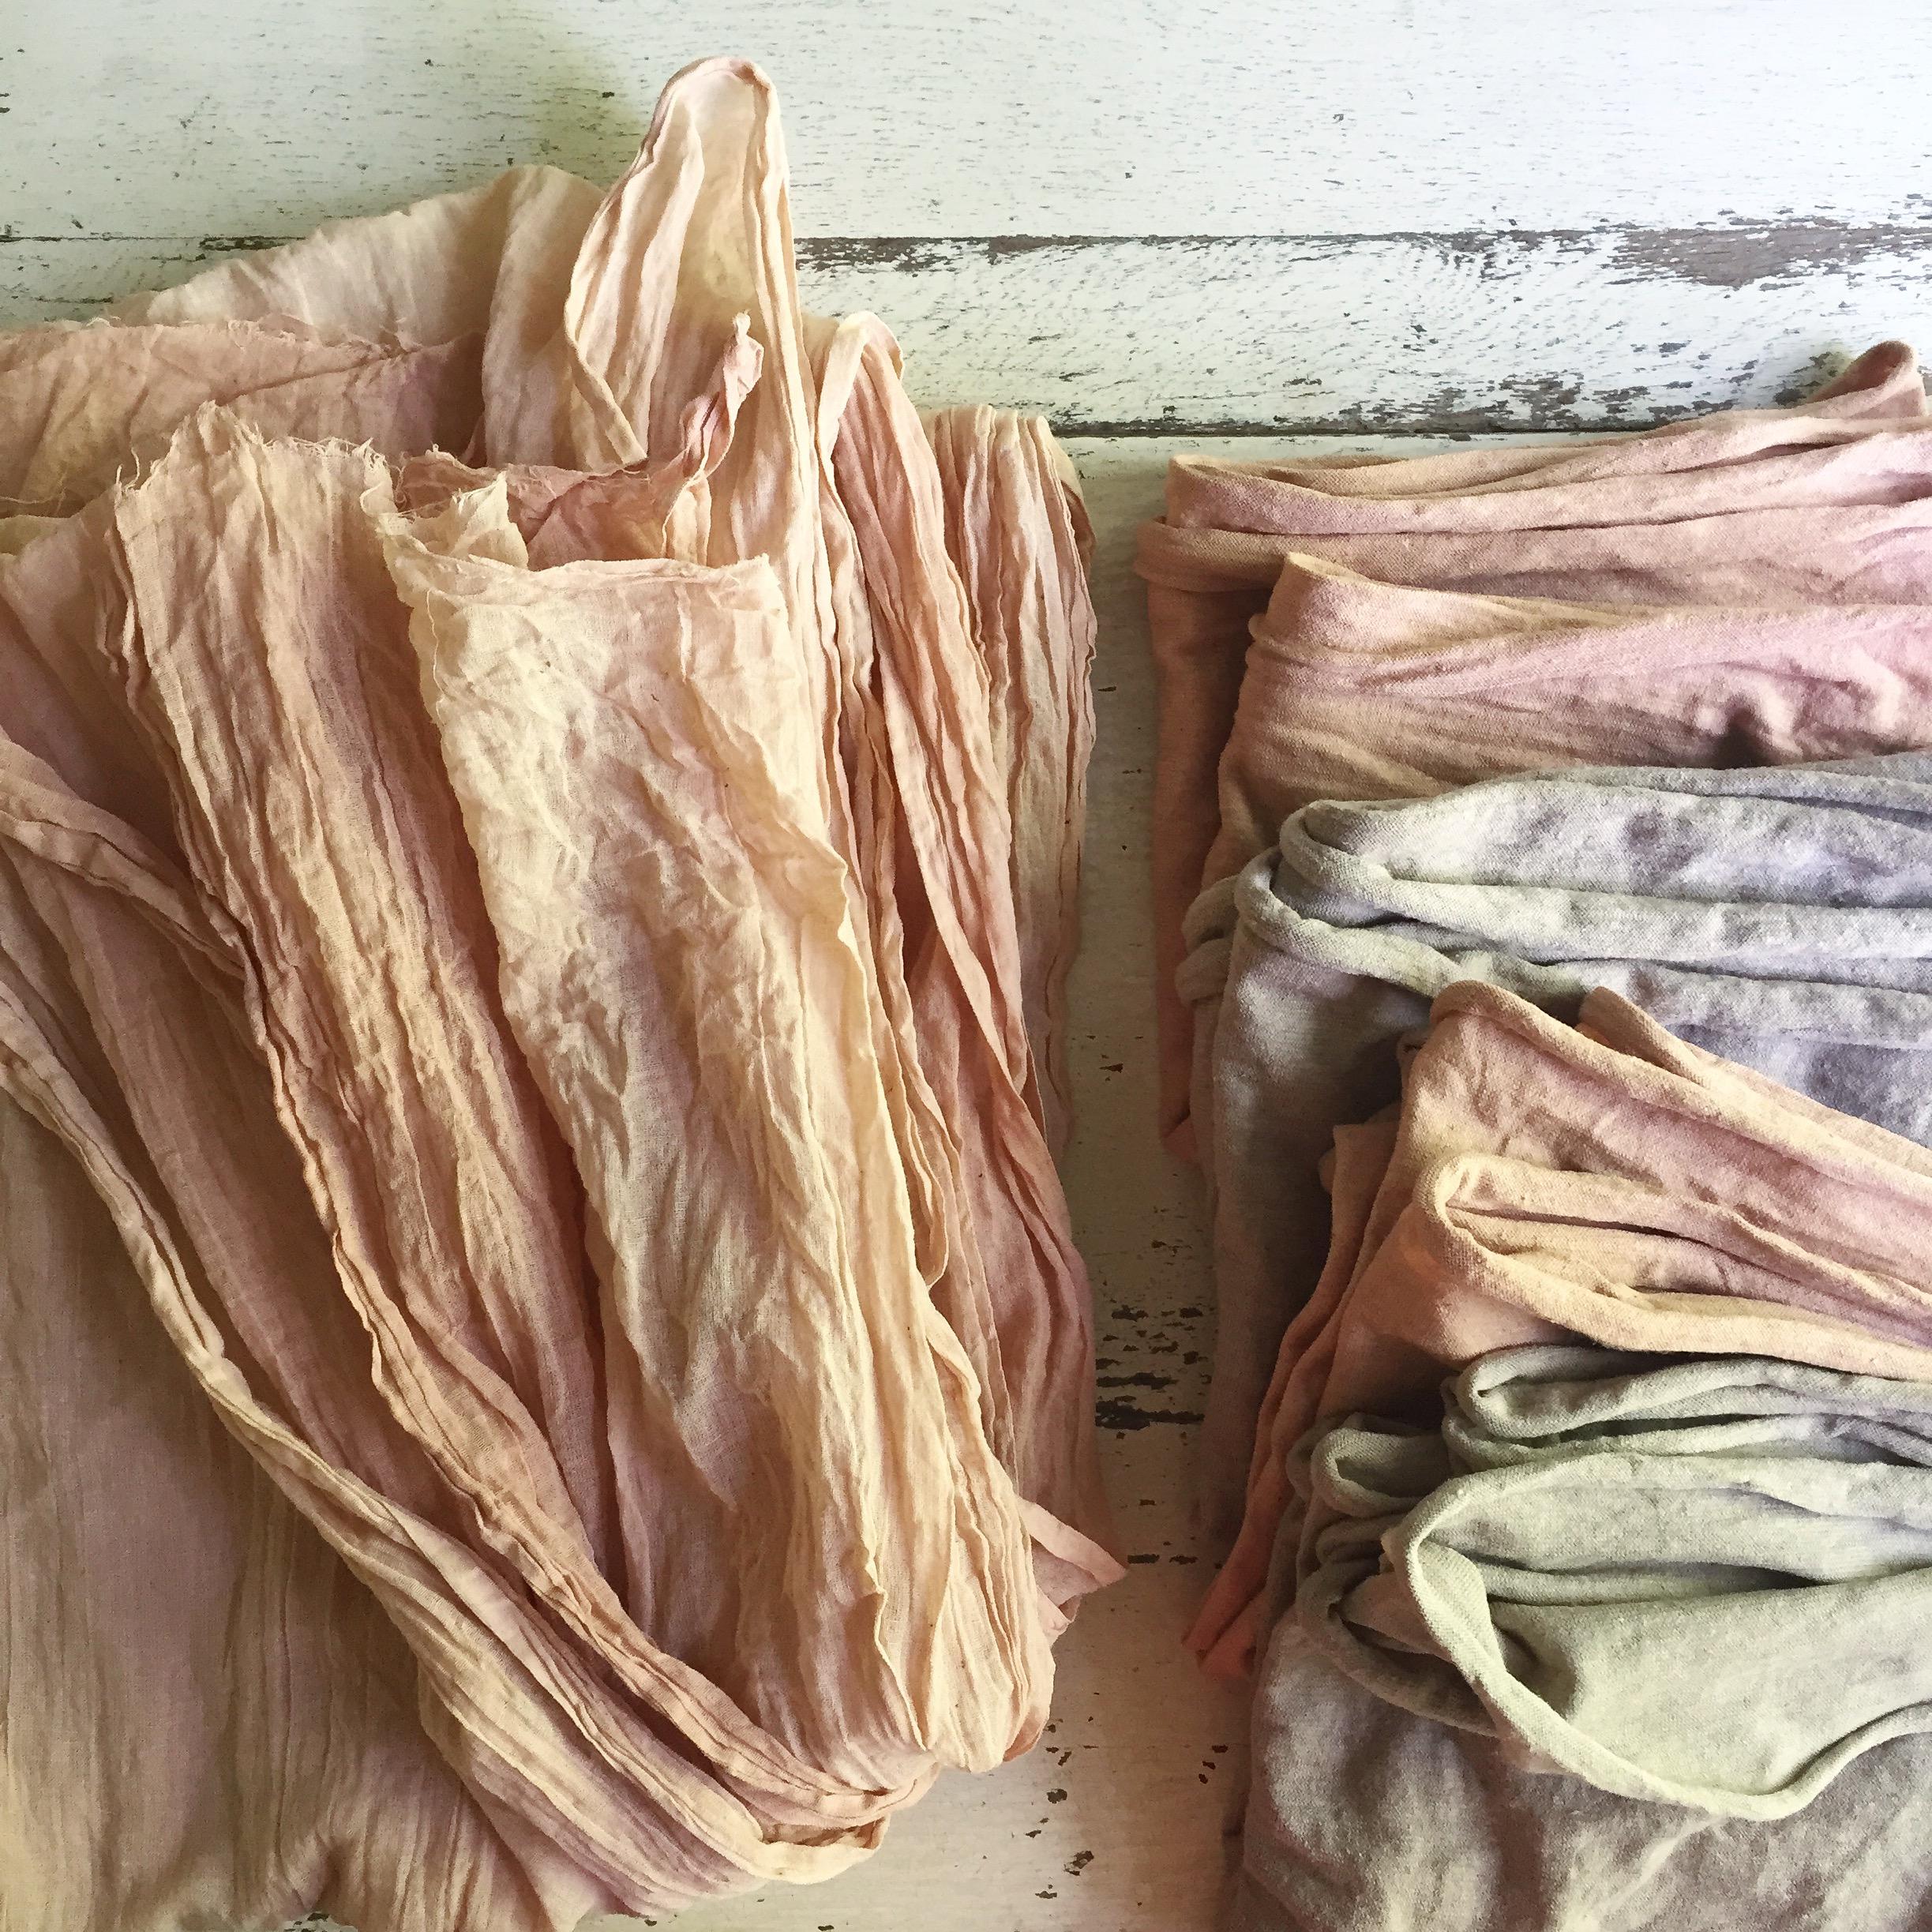 organic cotton gauze & hemp/cotton jersey scarves naturally dyed with avocado & black walnut.